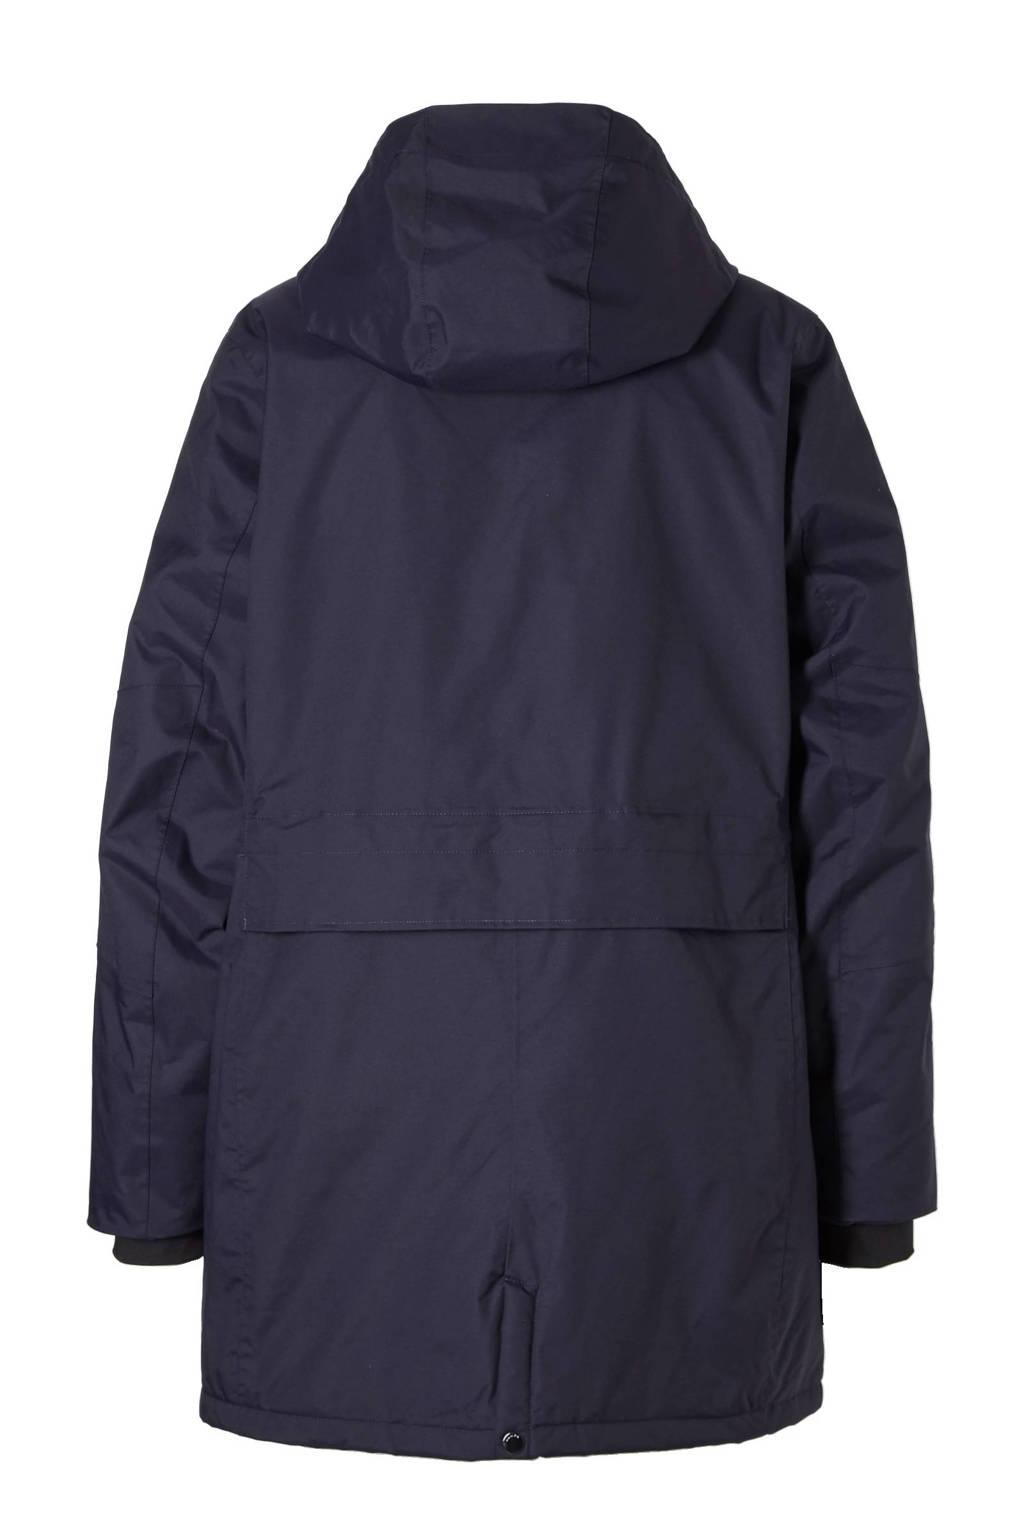 Luhta outdoor jas, Blauw